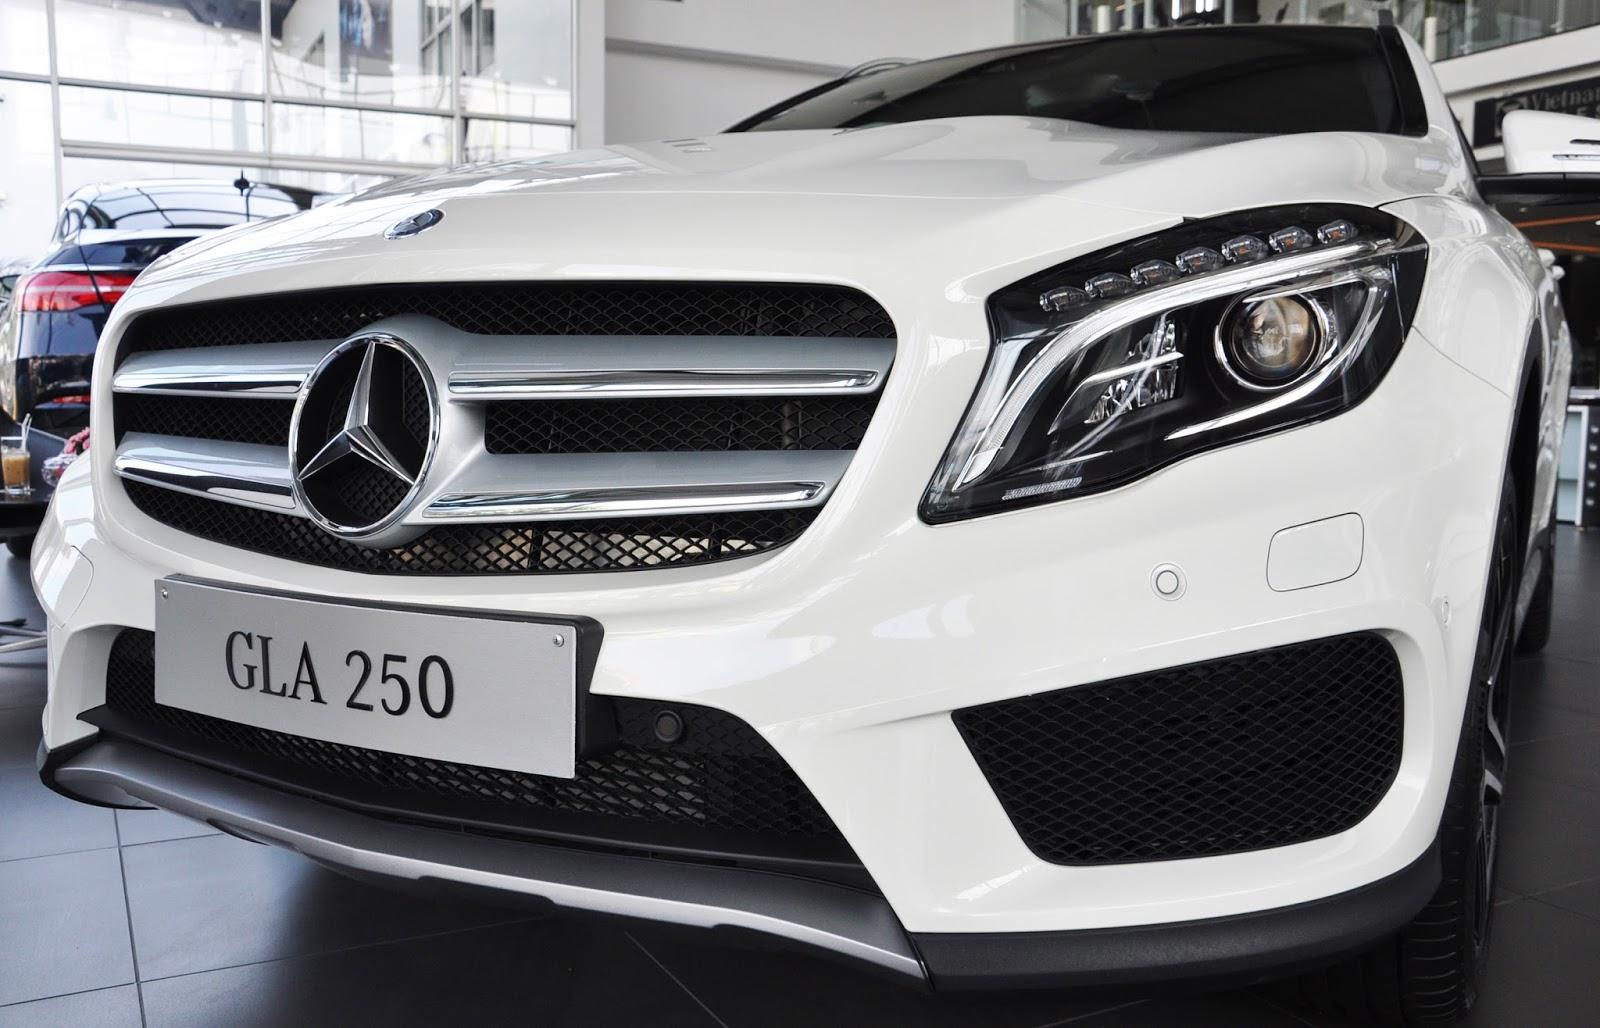 Xe Mercedes Benz GLA 250 4Matic màu trắng 04